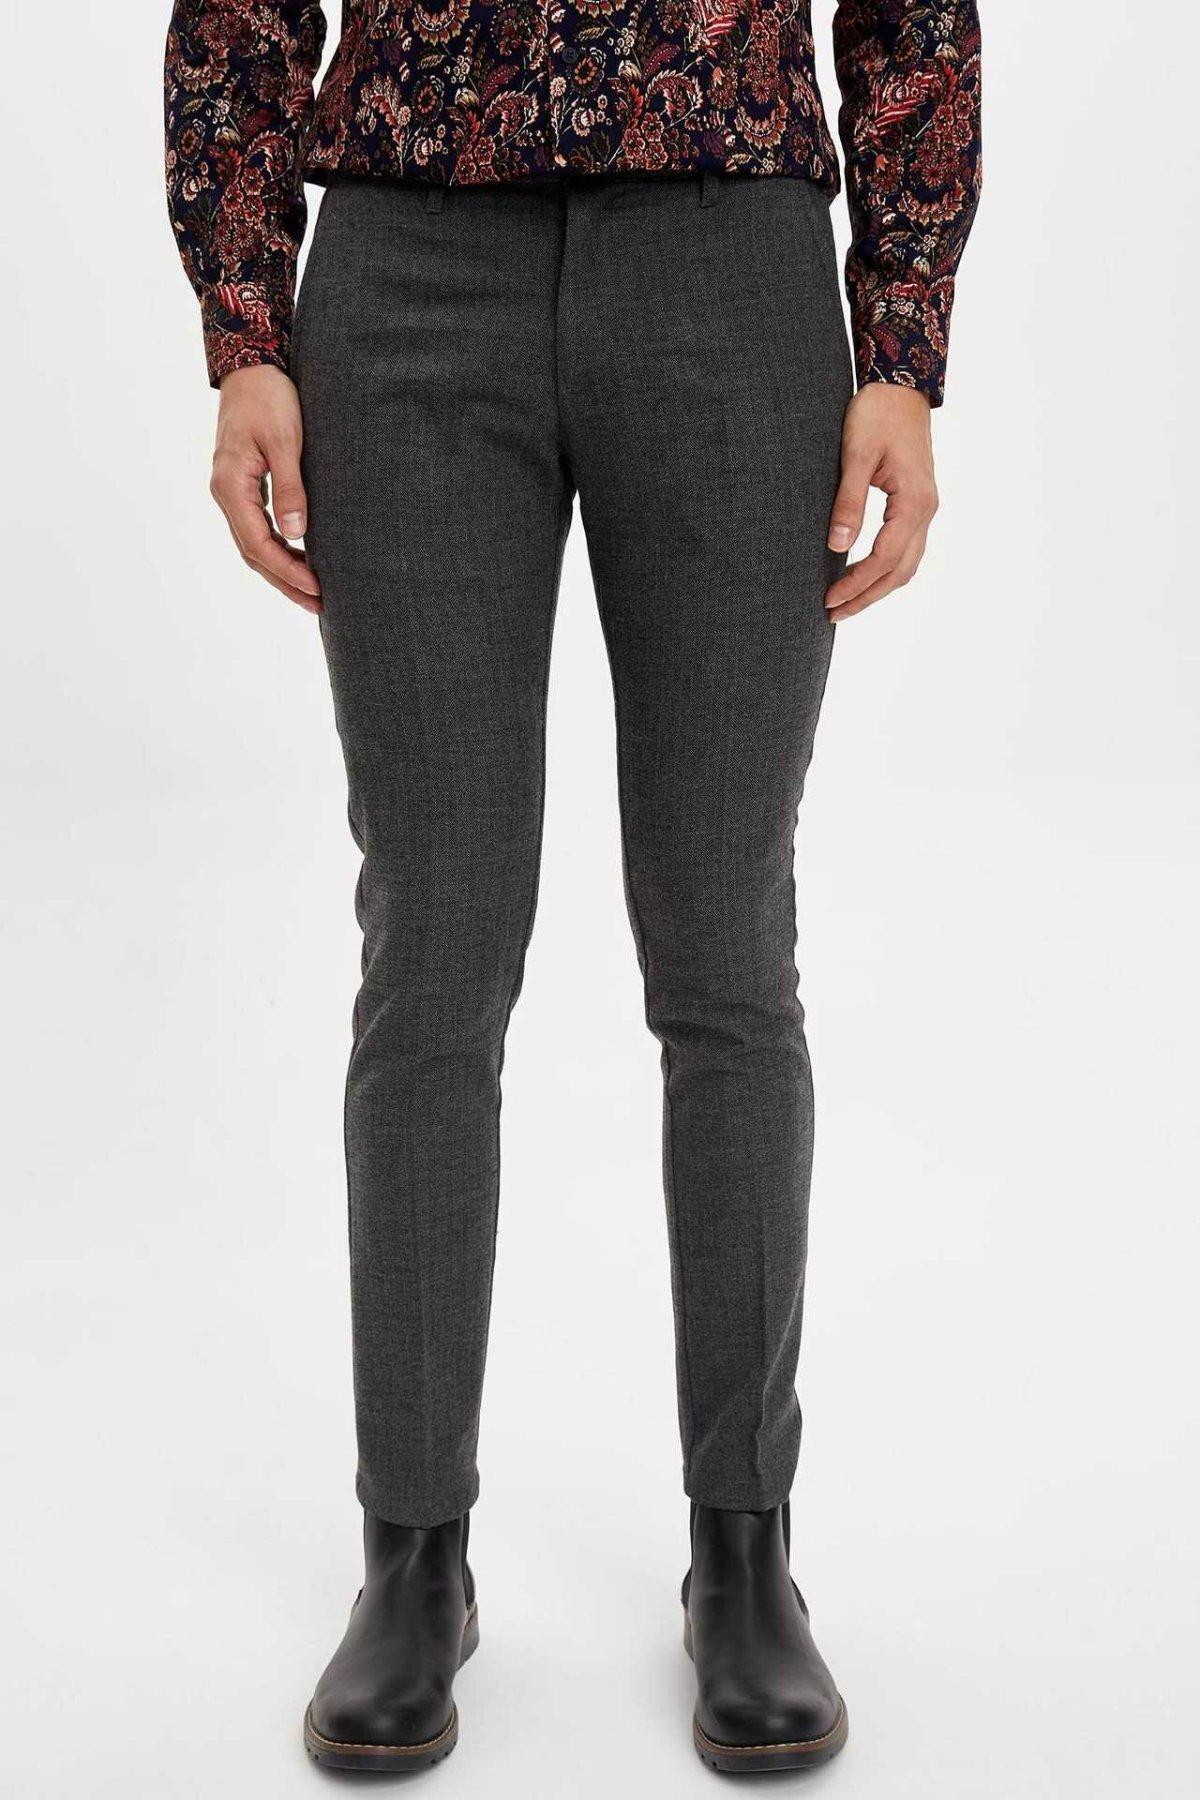 DeFacto Man Winter Casual Long Pants Men Dark Grey Slim Bottoms Male Mid-waist Trousers-M2348AZ19WN